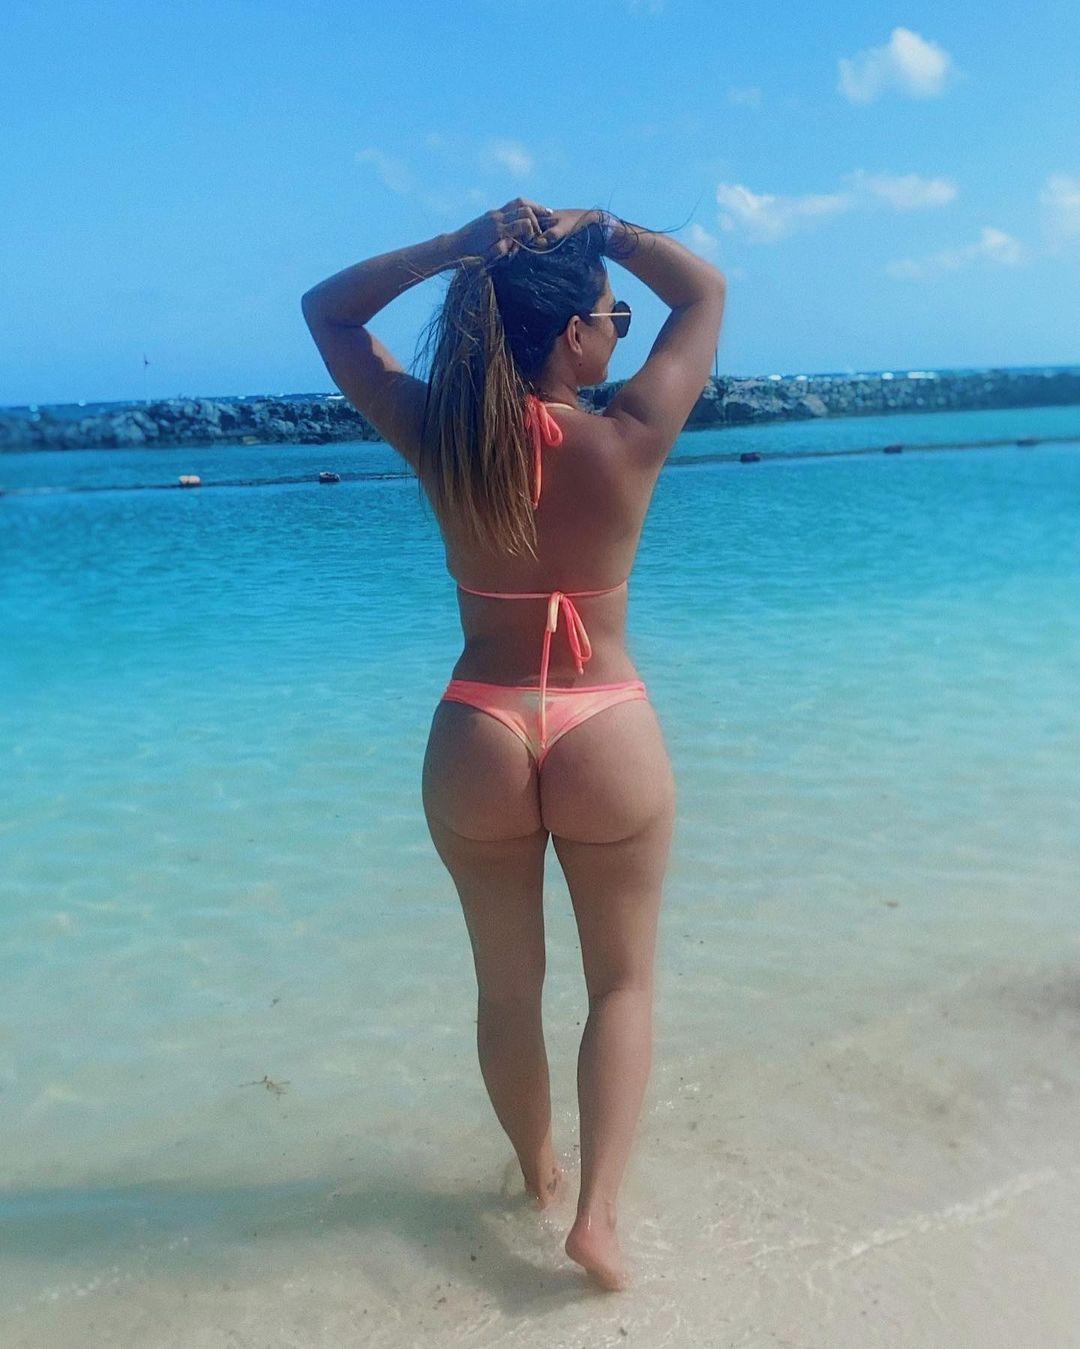 laura prieto bikini